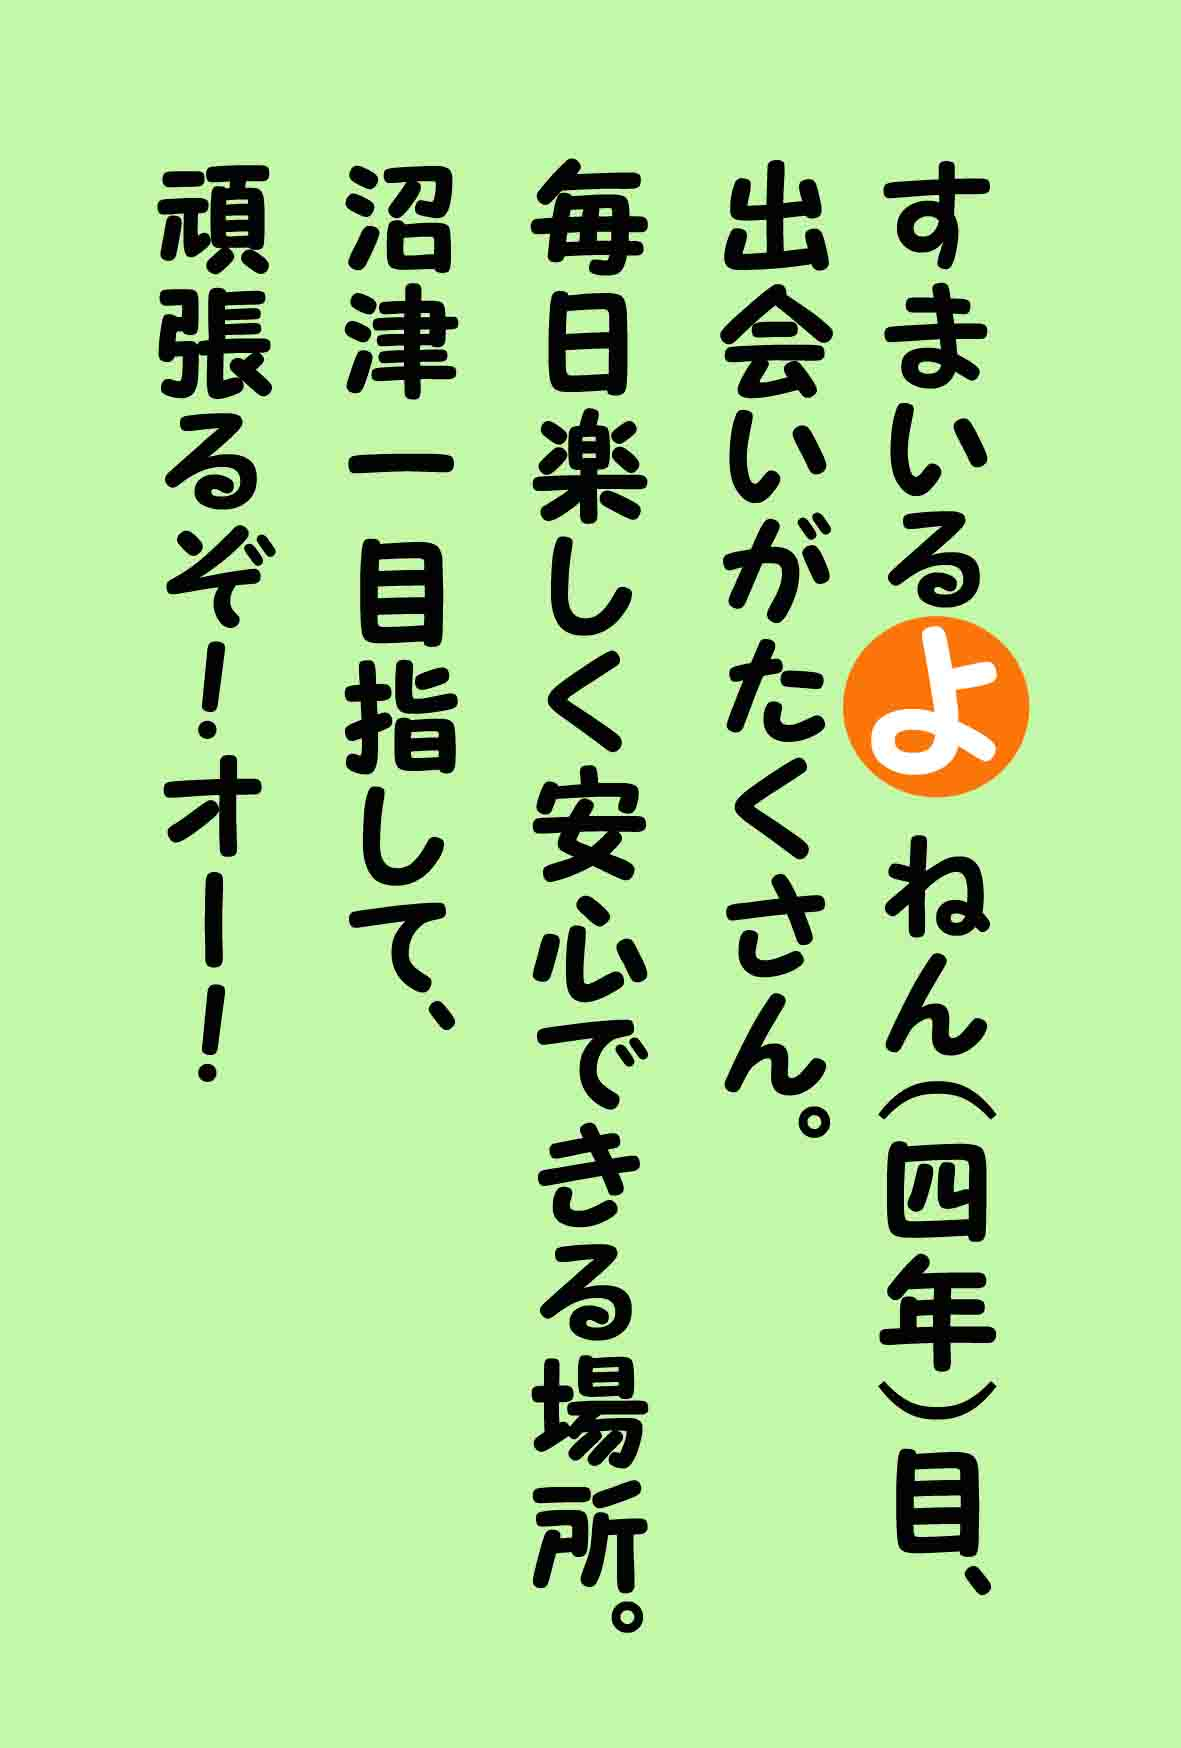 http://igs-kankan.com/article/%E3%81%8B%E3%82%93%E3%81%8B%E3%82%9307.jpg